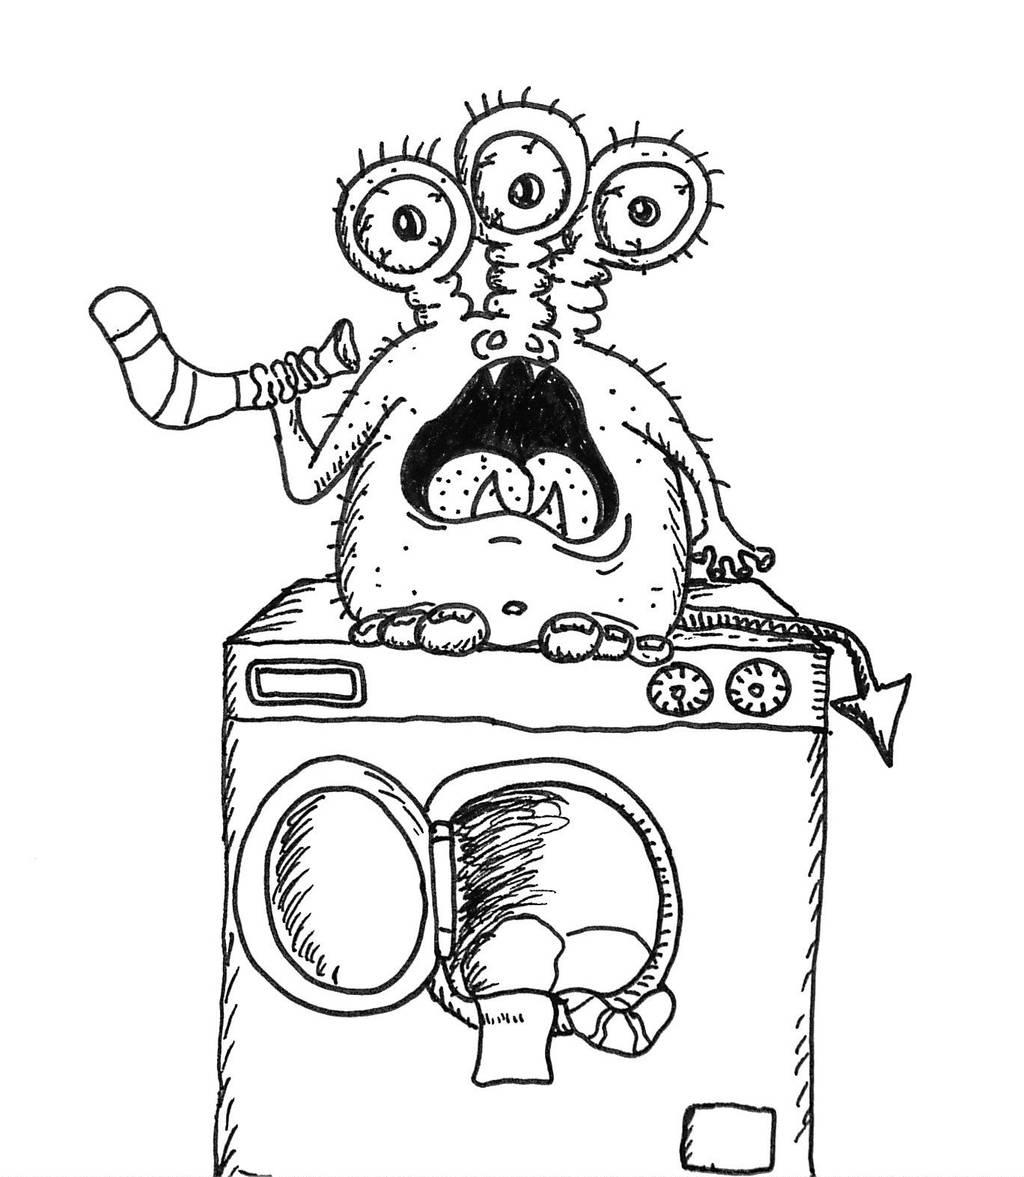 Laundry monster by chbj